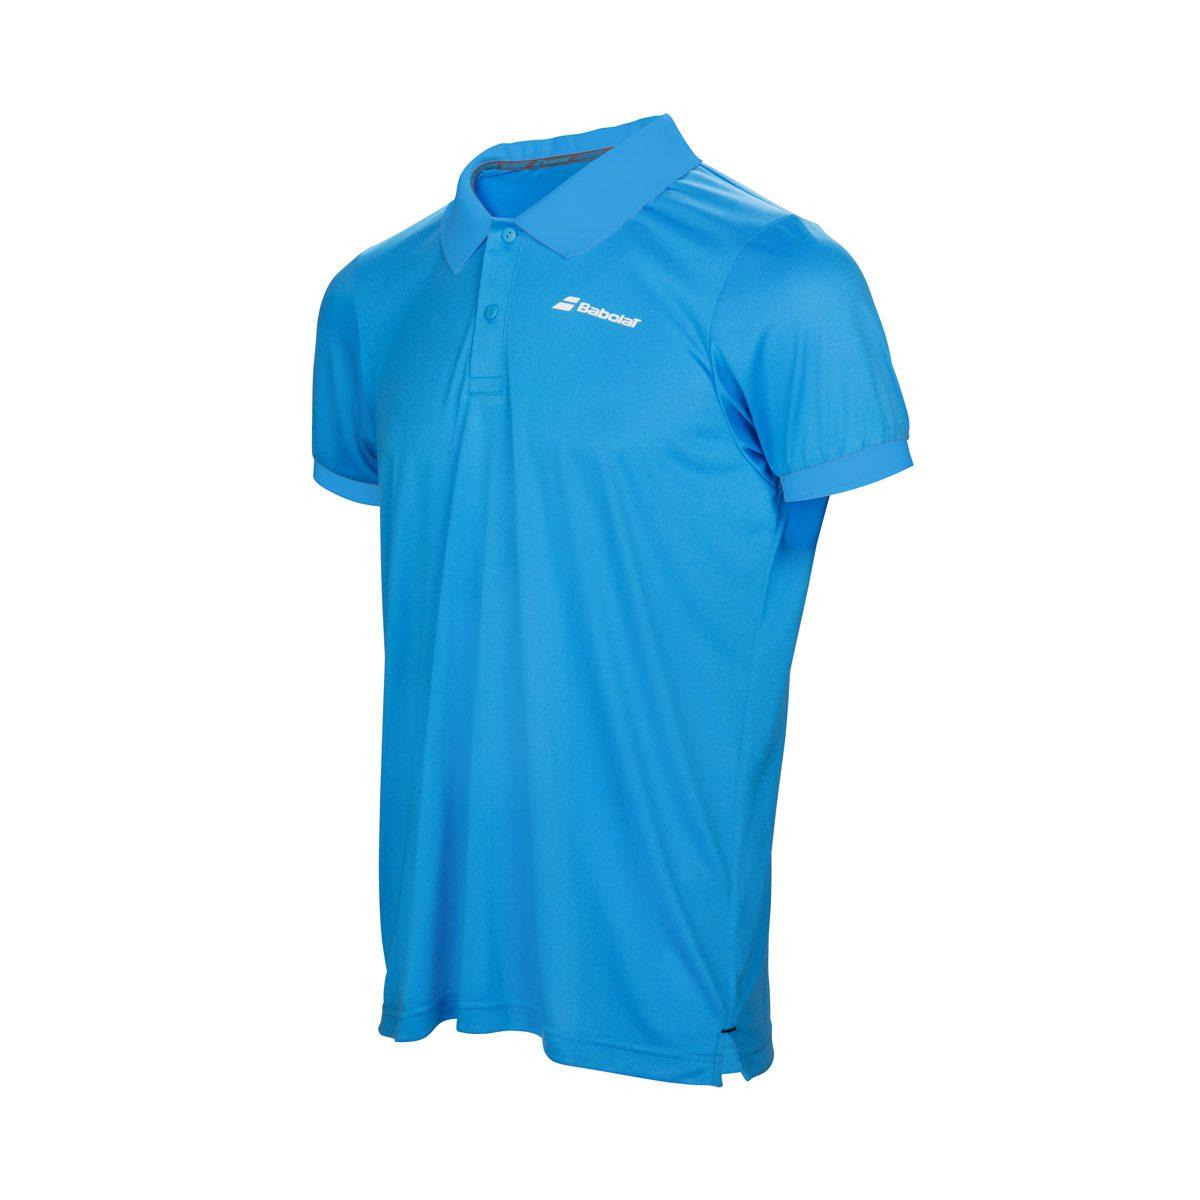 Babolat Men S Core Club Polo Shirt Blue Peake